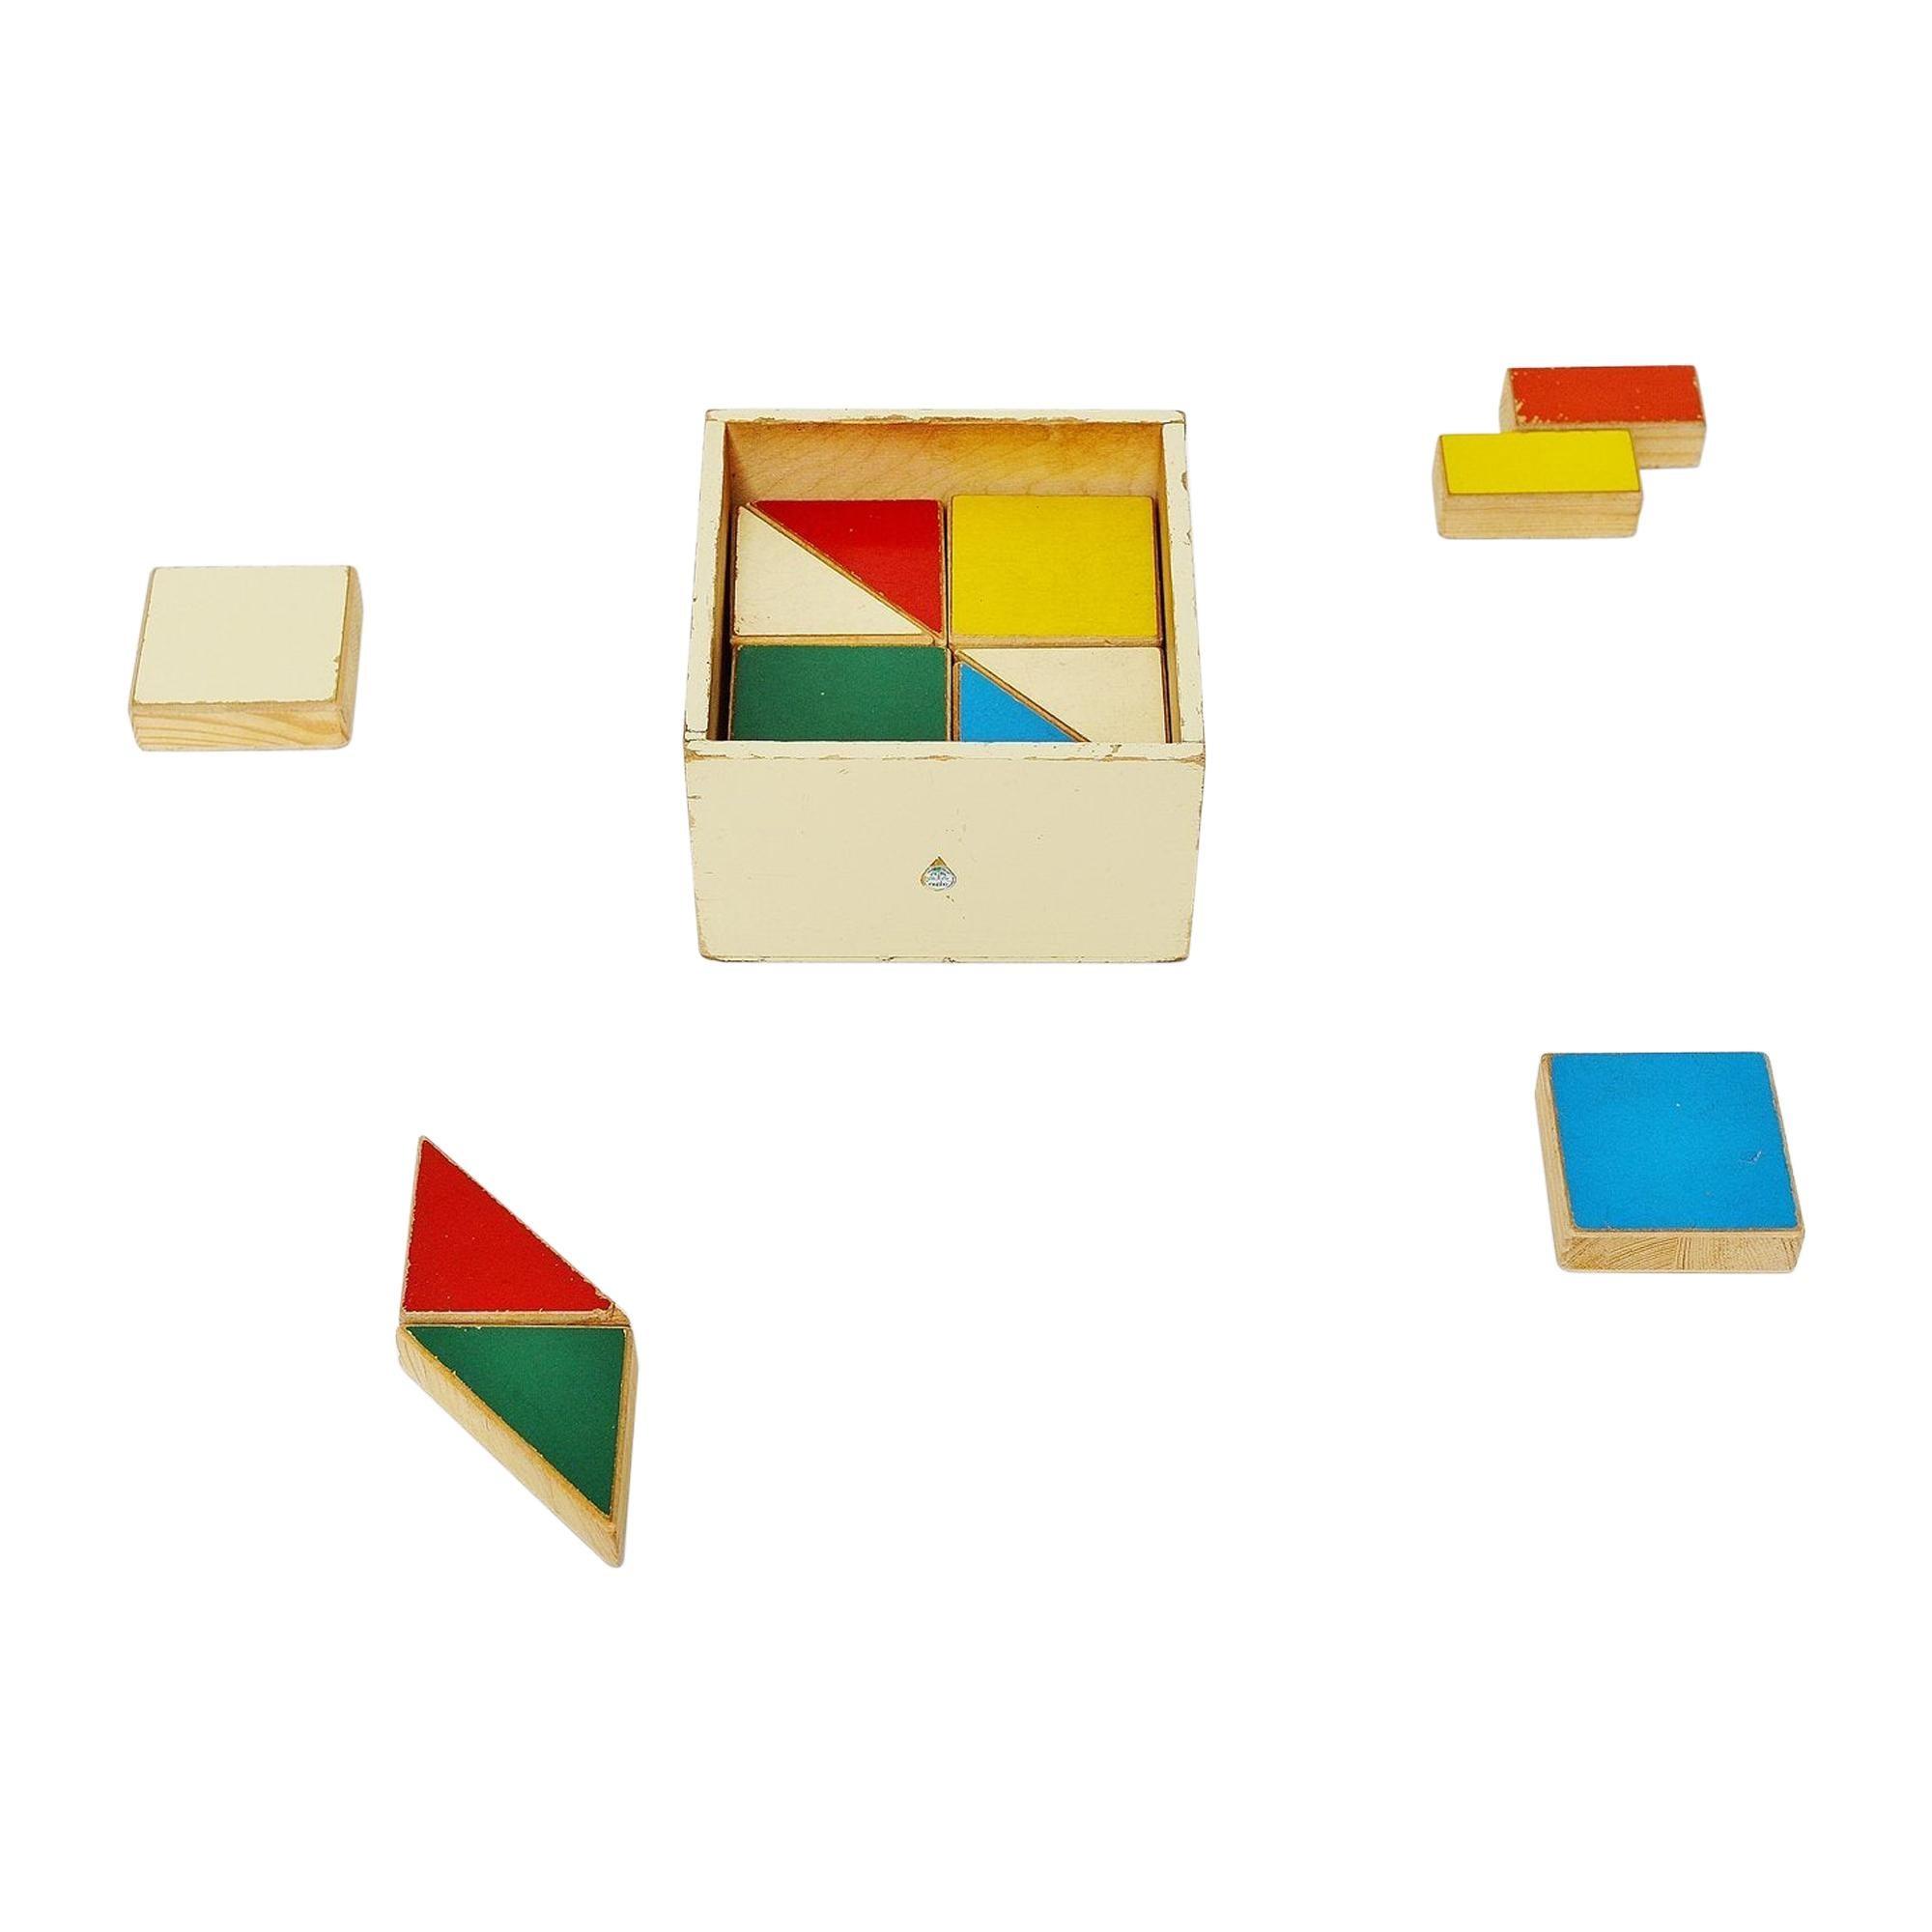 Ado Puzzle Cubes Box Ko Verzuu, Holland, 1955